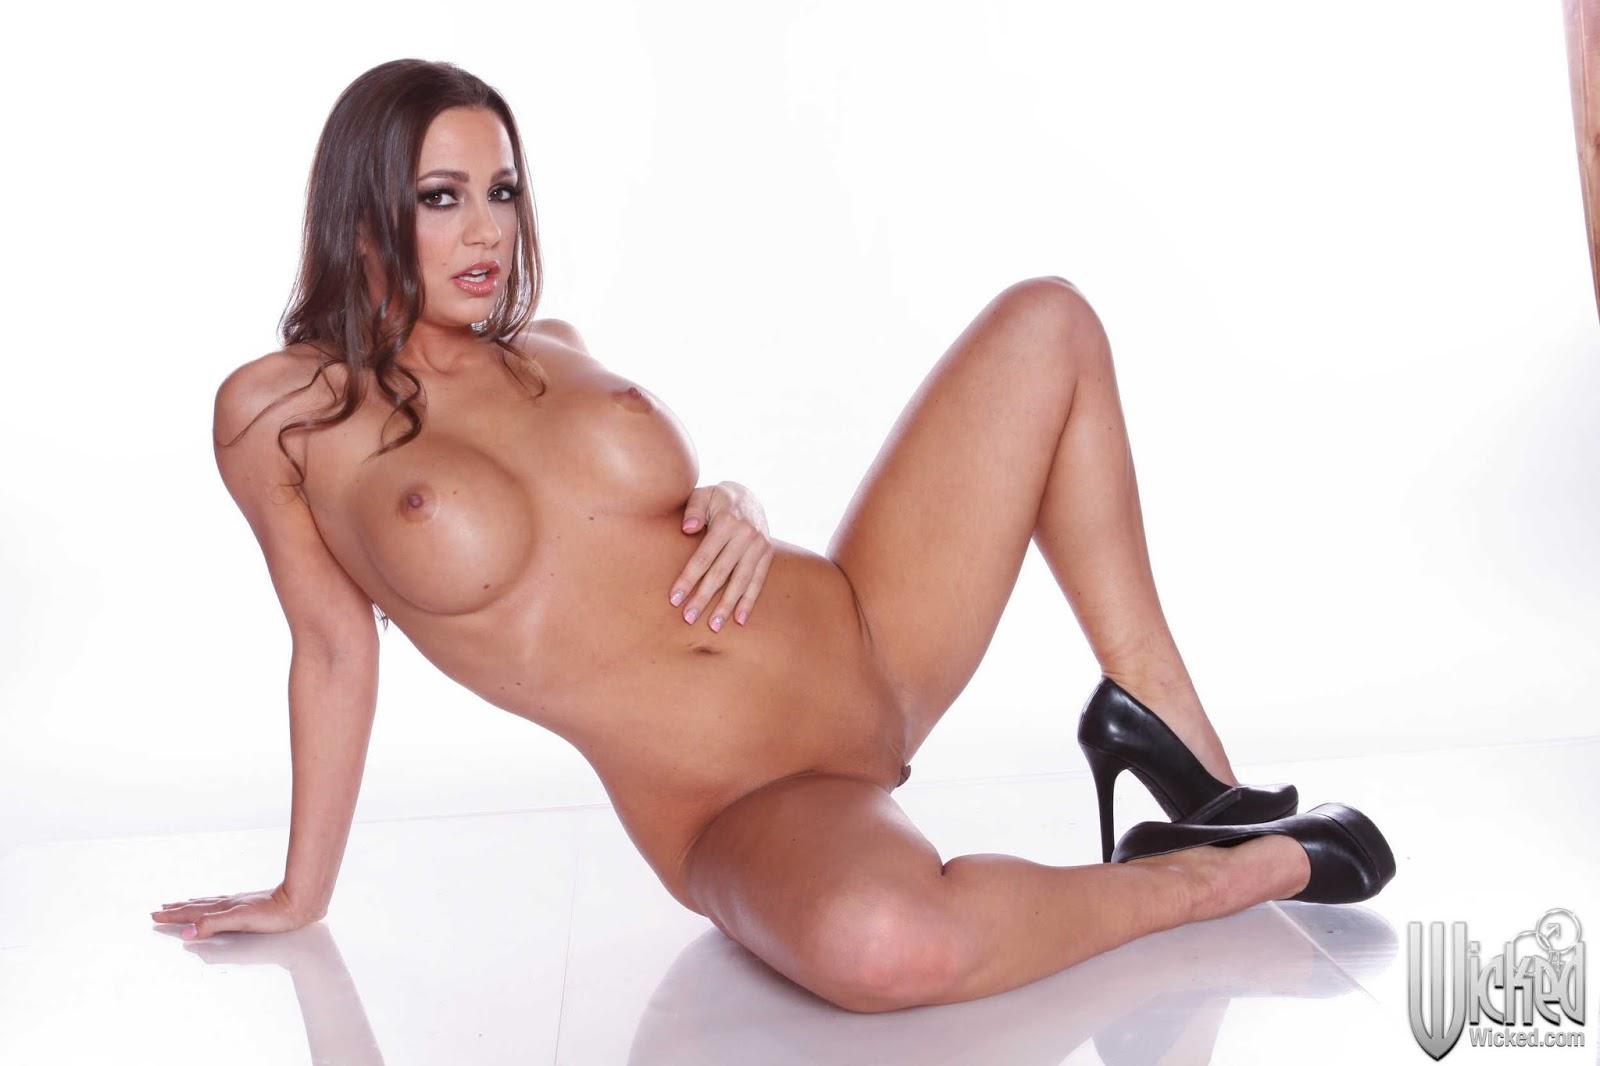 Xxx 25 Porn Star Abigail Mac Nude Photos Naked Sex Porn ...